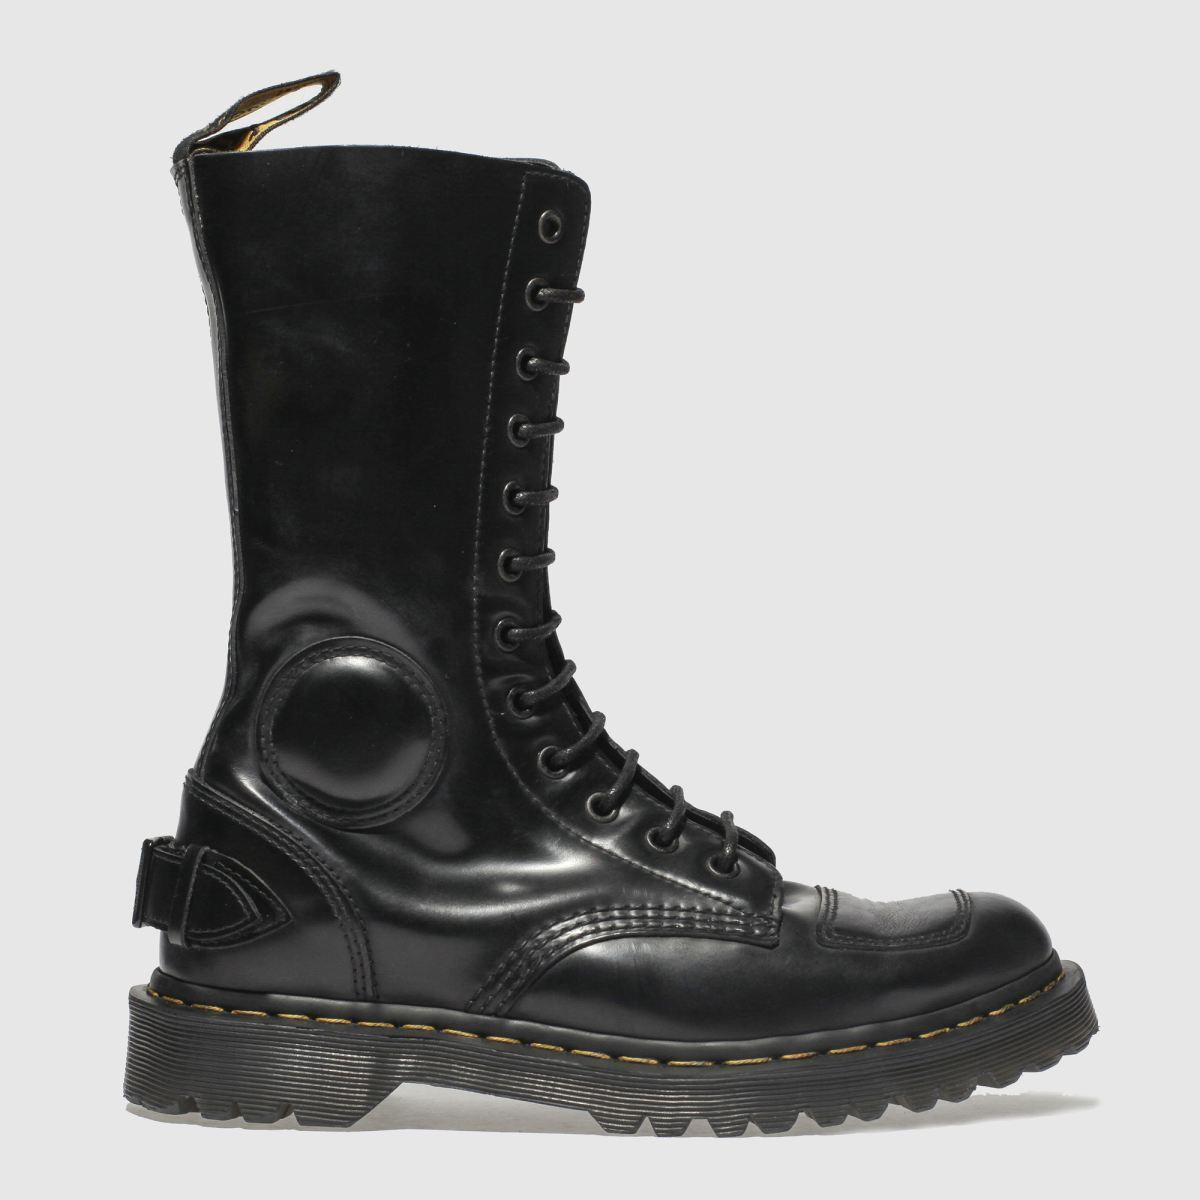 Dr Martens Black Neilson Boots